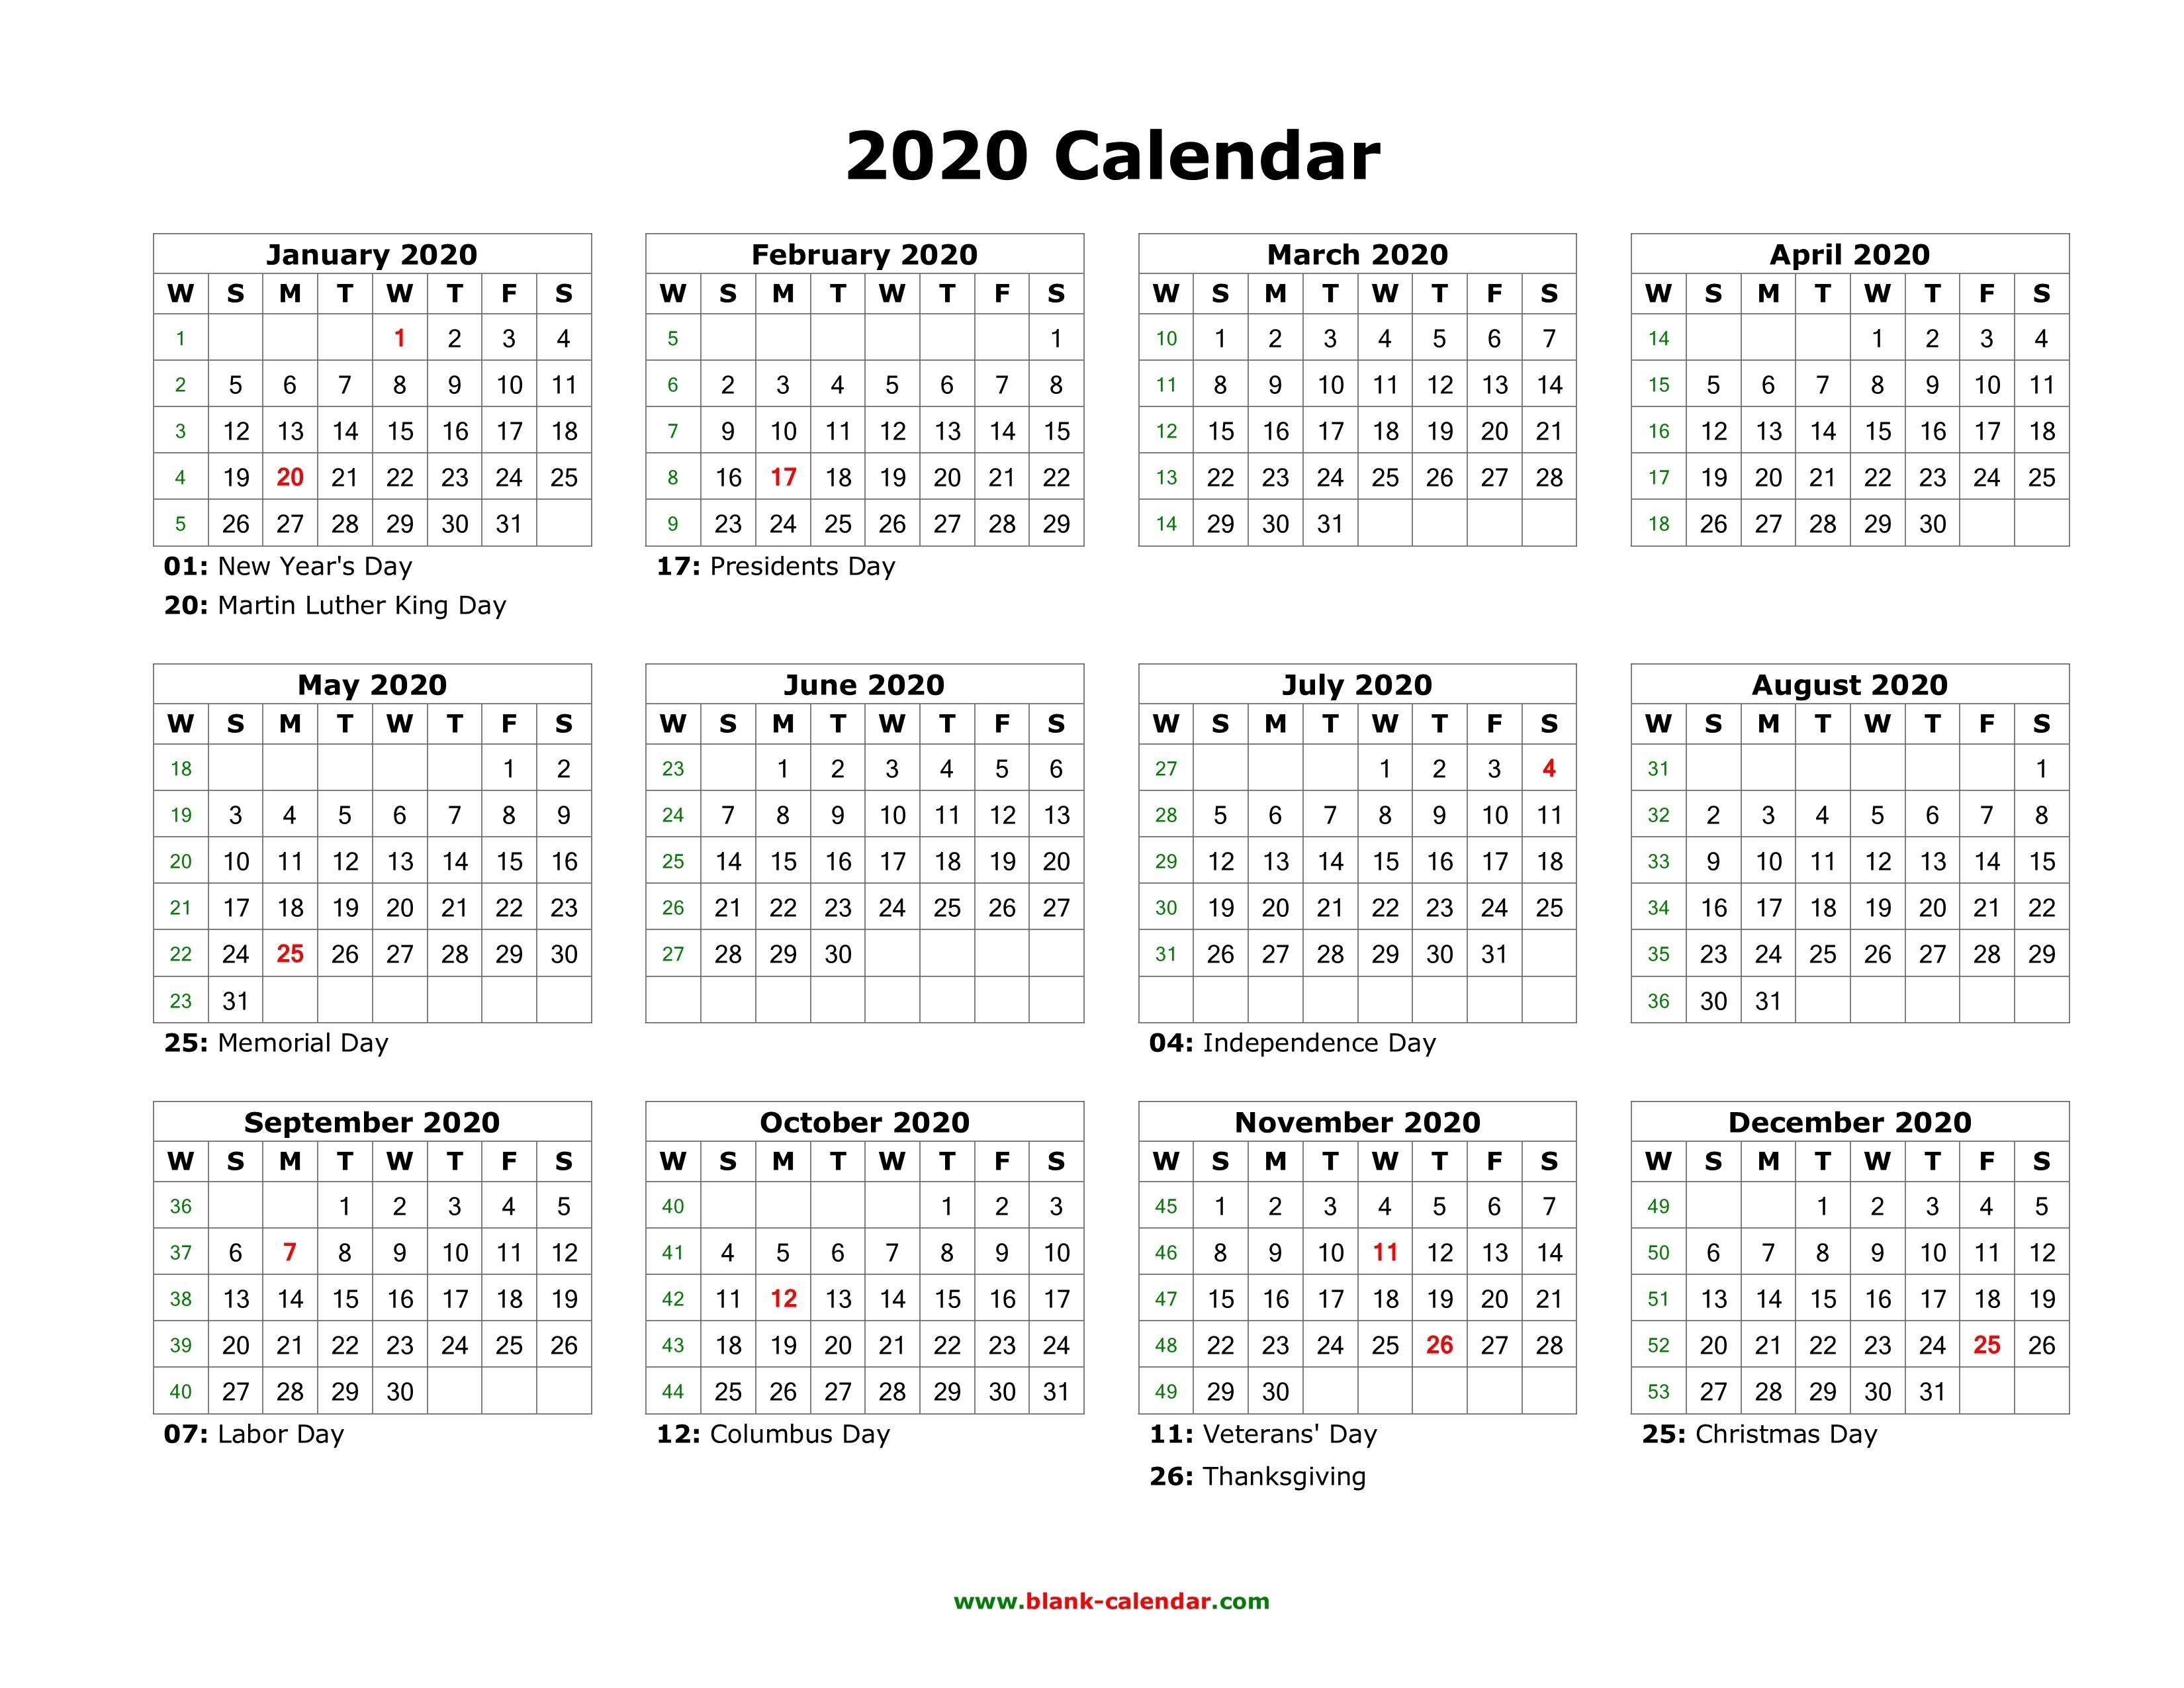 Blank Calendar 2020   Free Download Calendar Templates-Blank 2020 Calendar Printable 2 Month